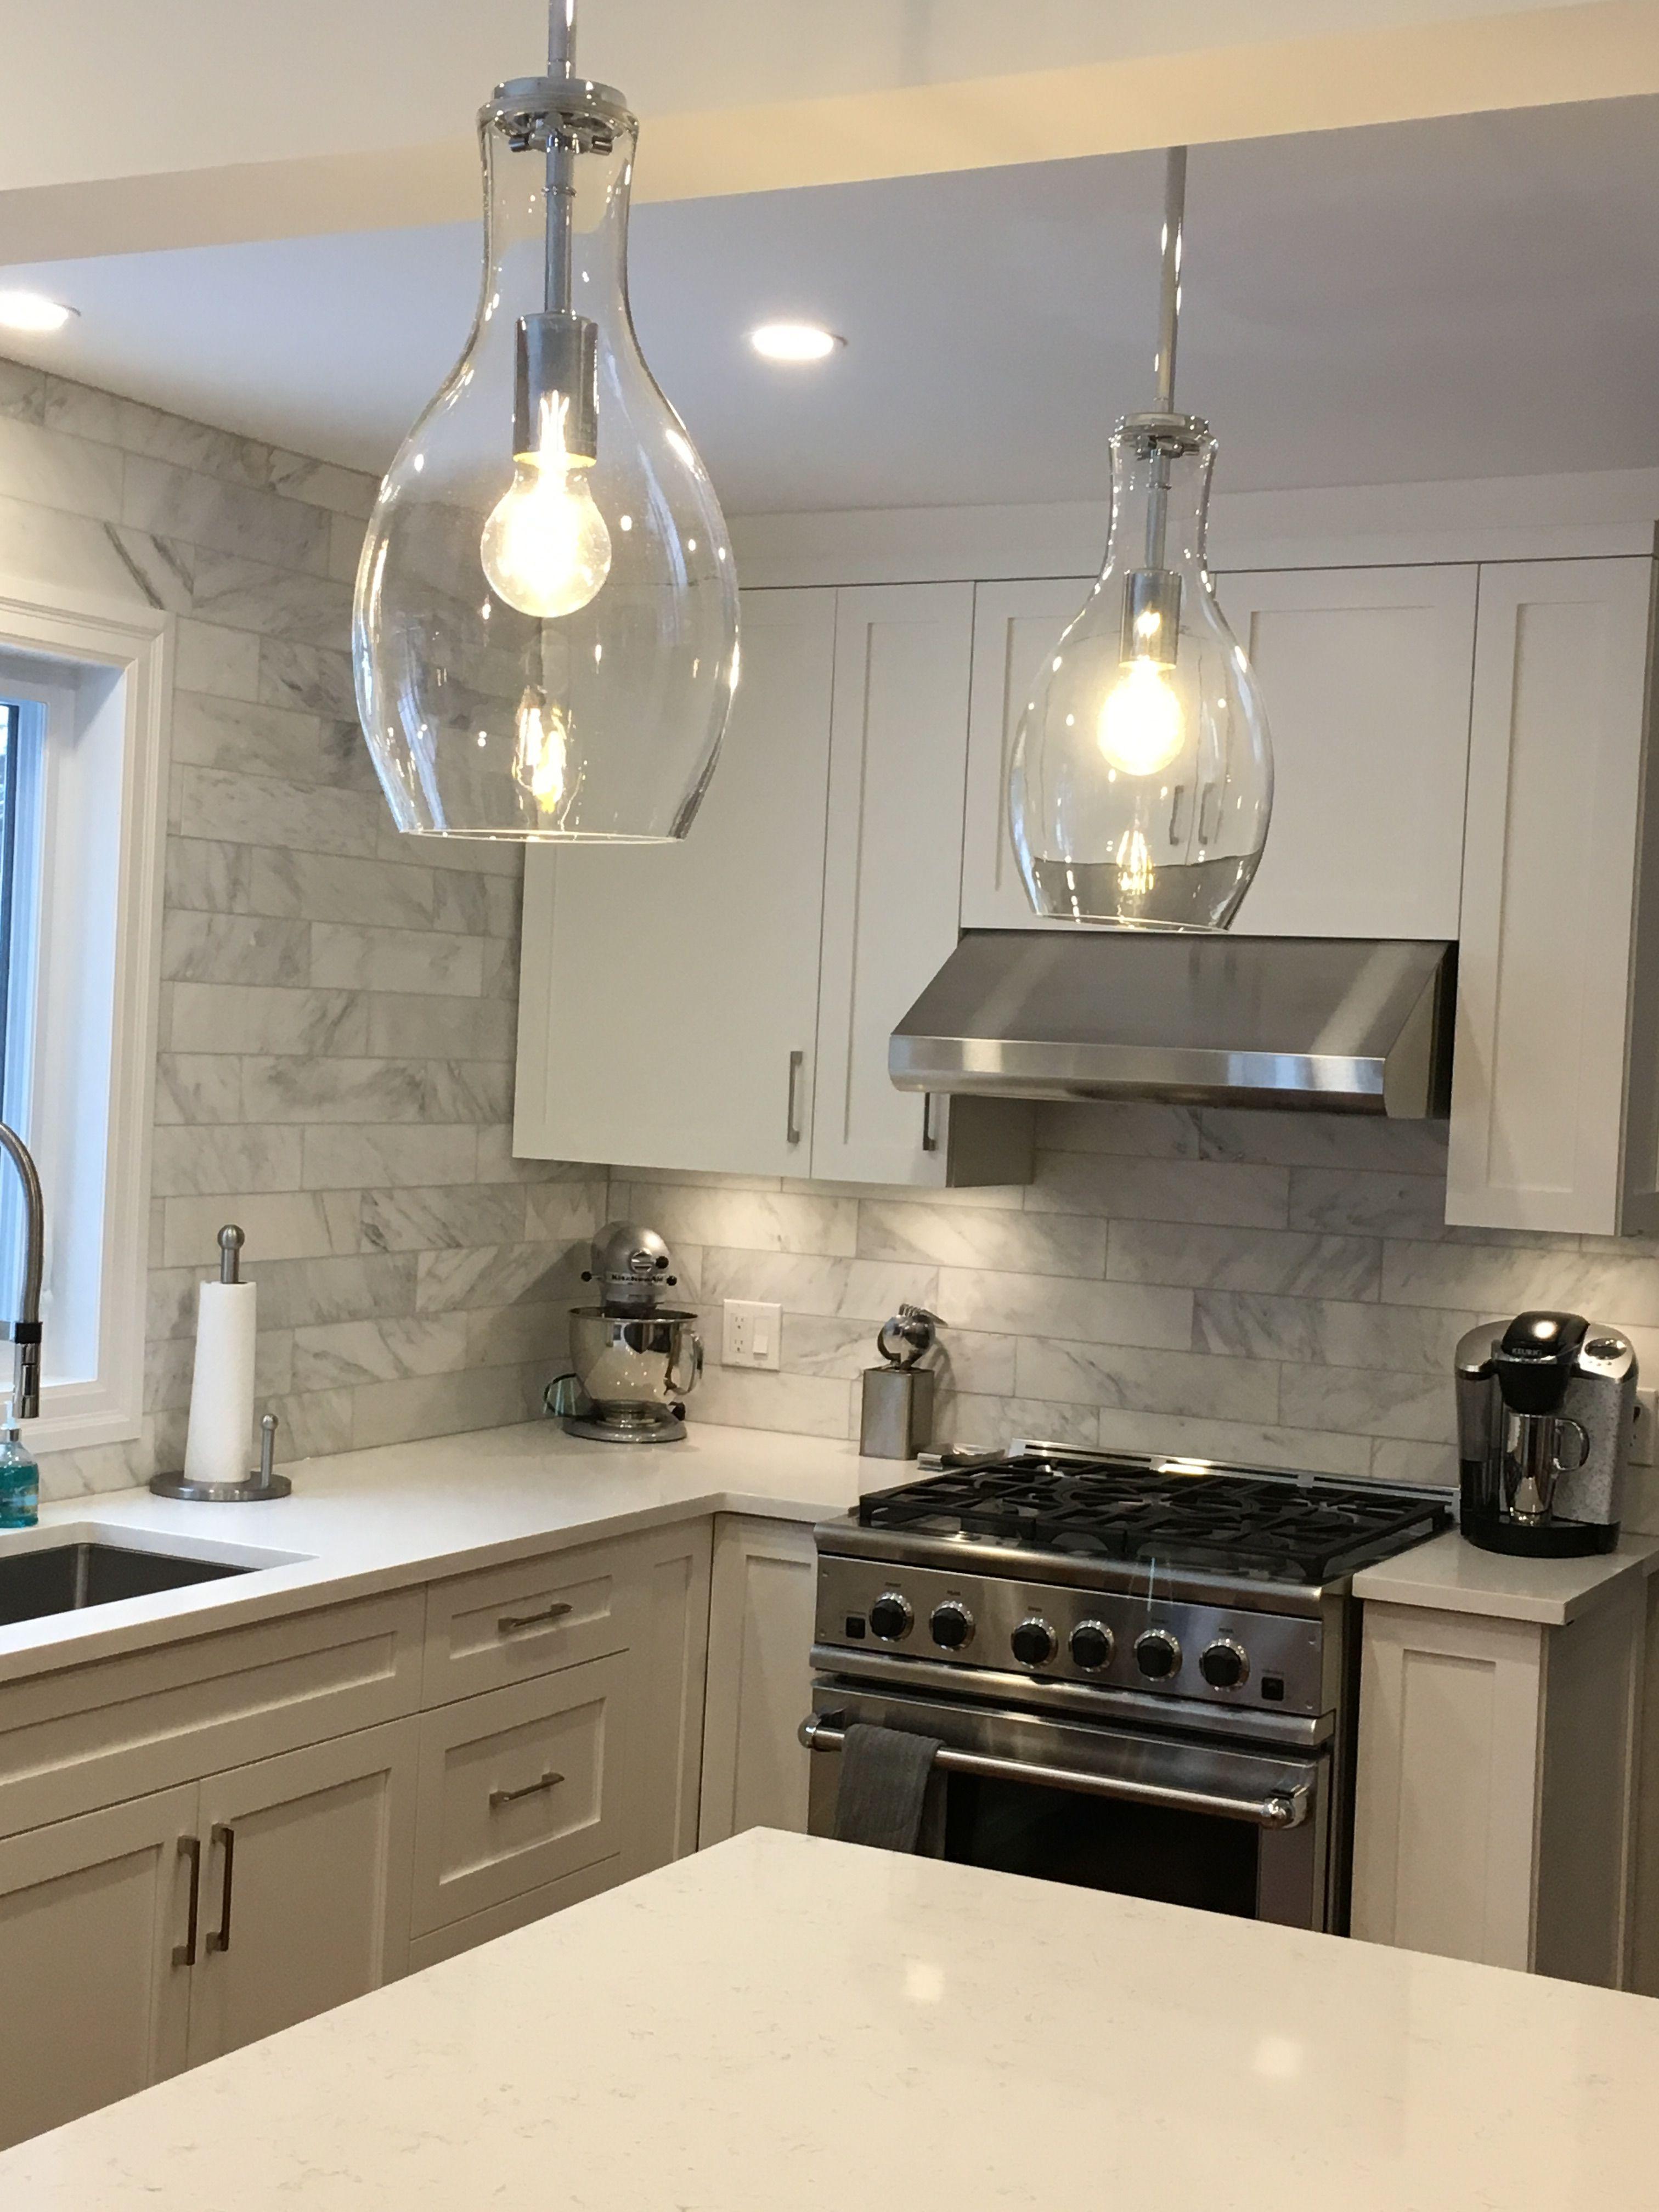 Grey White Kitchens Kitchen Pendant Island Lighting Kichler Everly Chrome Wit Kitchen Island Lighting Pendant Kitchen Island Lighting Best Kitchen Lighting